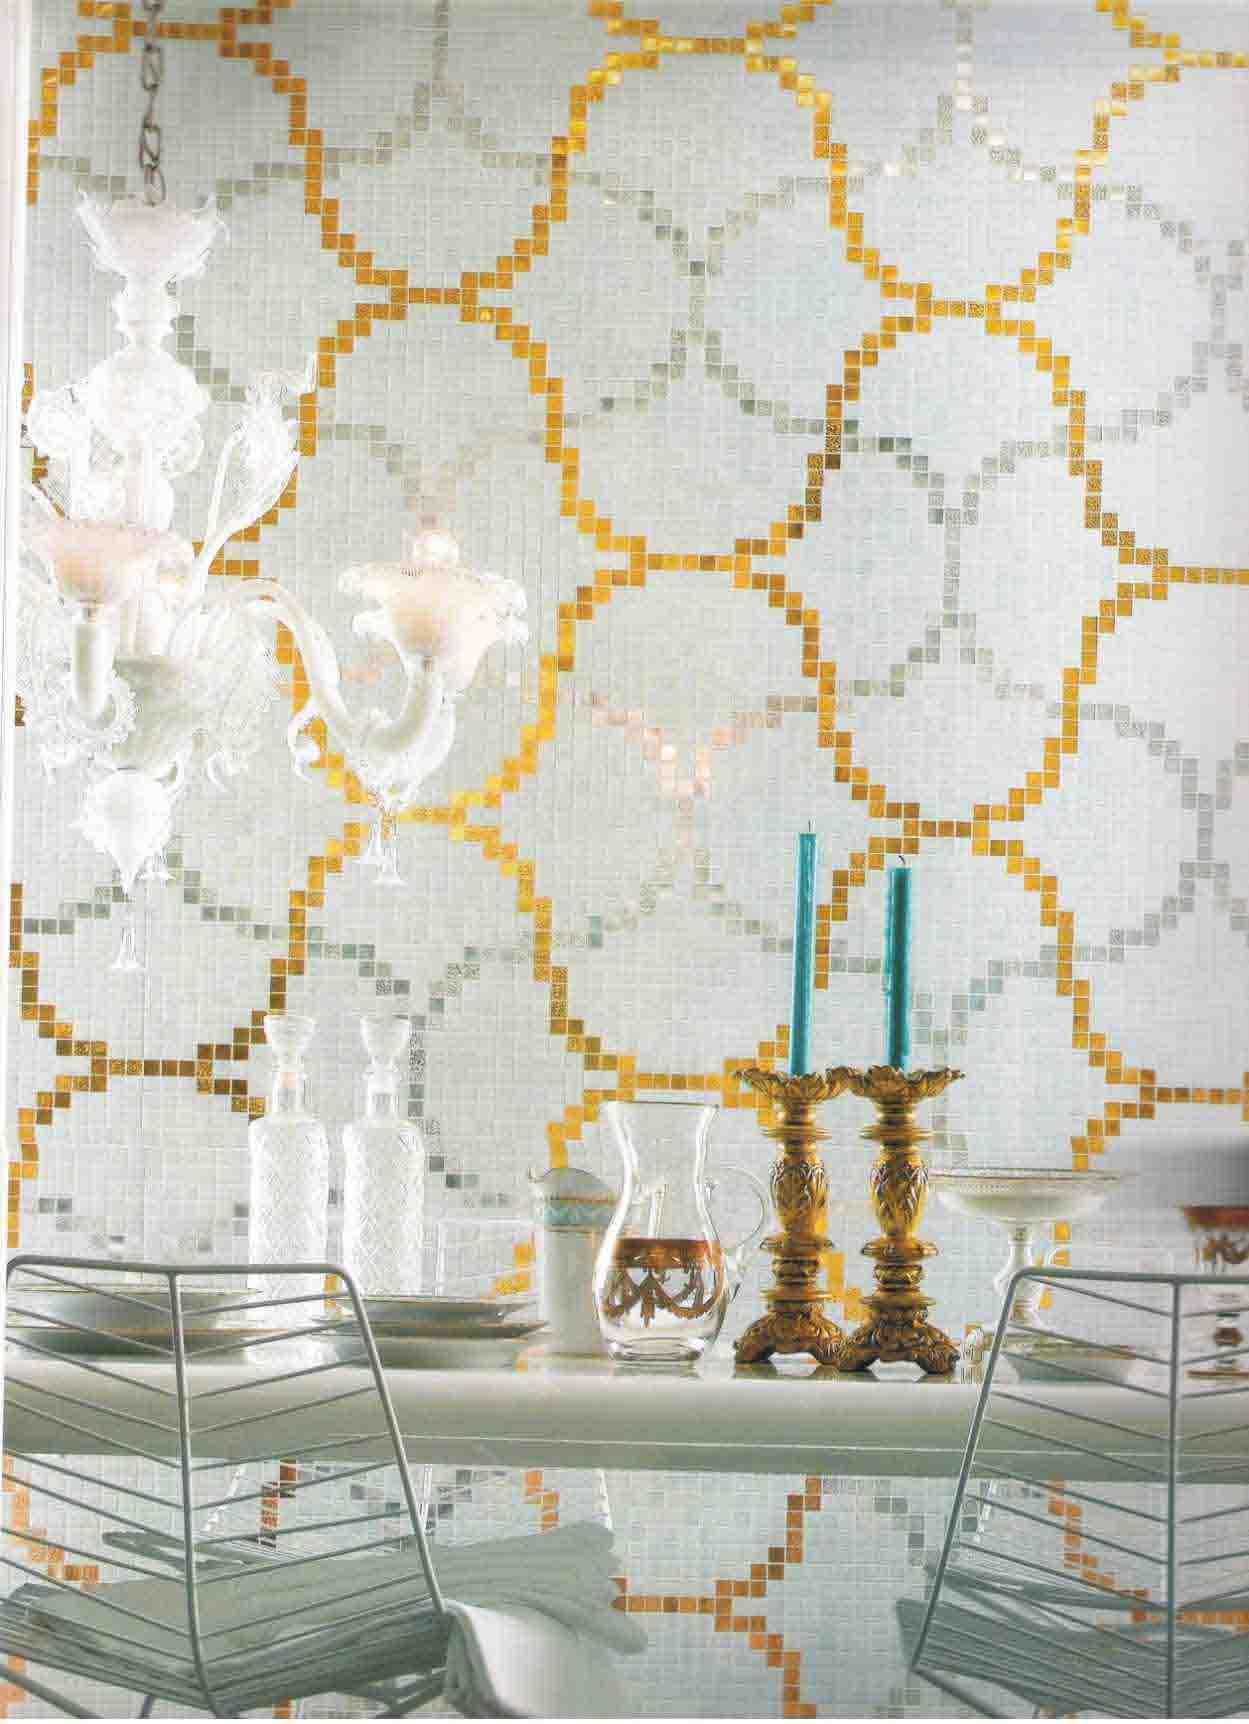 Pattern-Ceramic-Mosaic-Tile-RS-MJT801J01-